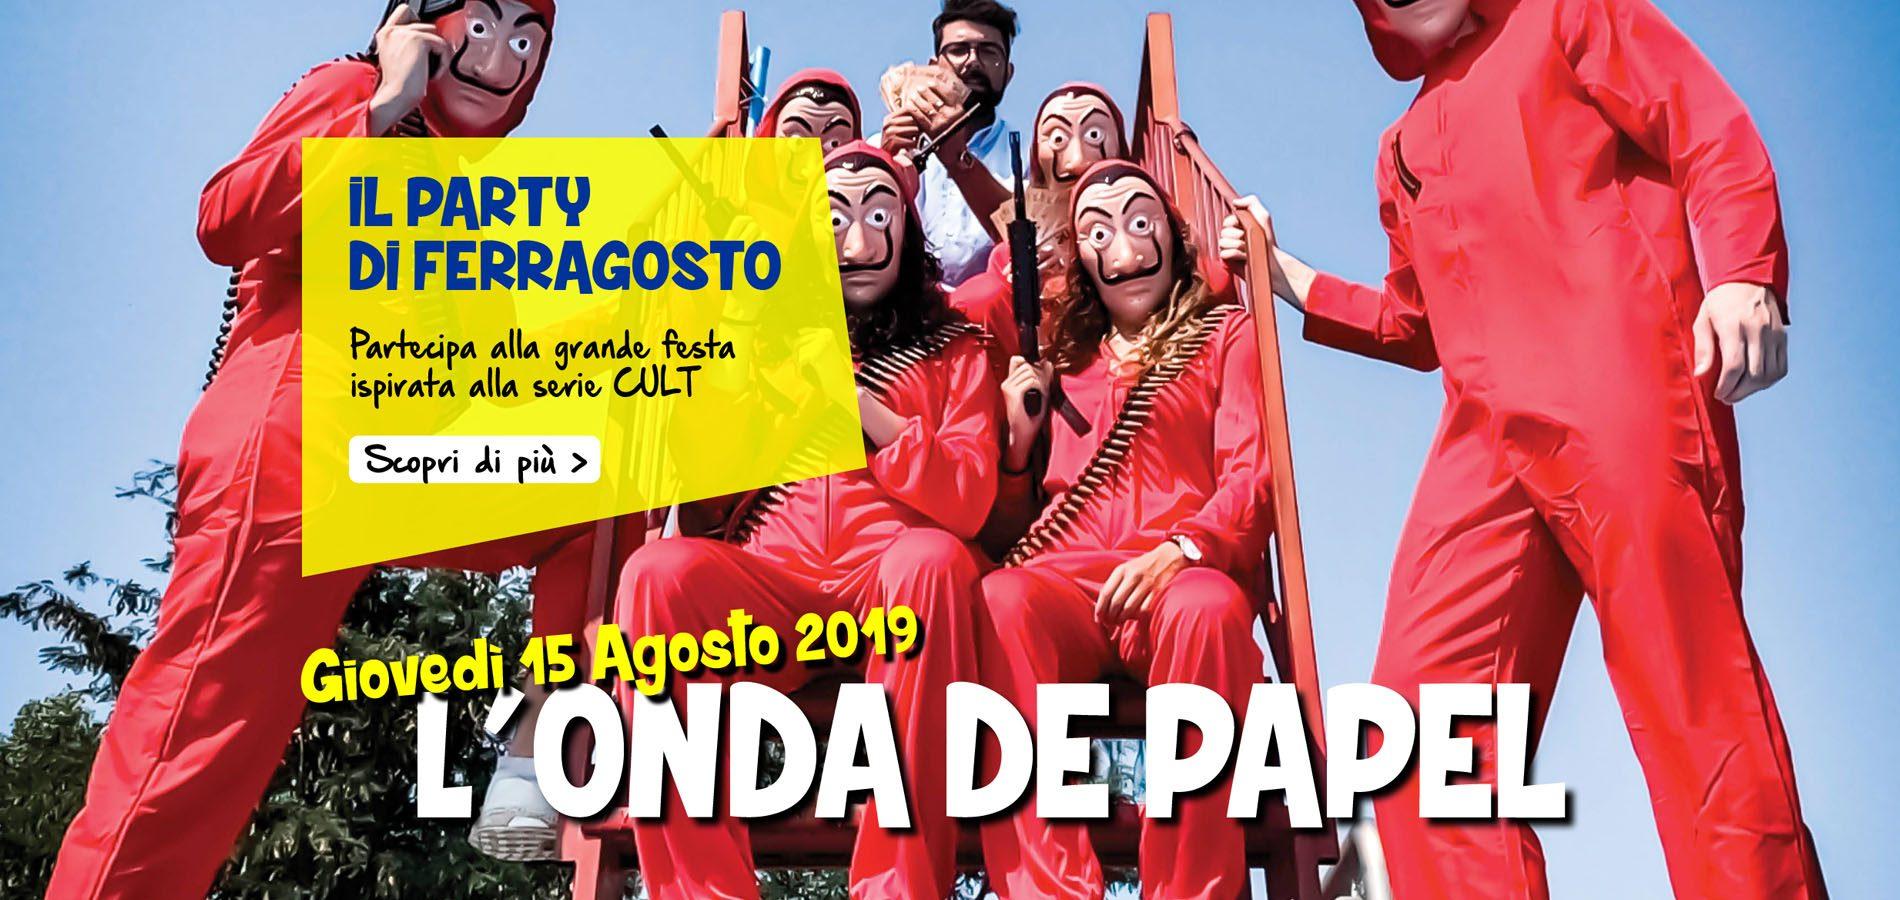 SFONDO_ORGINALE_WEB_15_08_2019